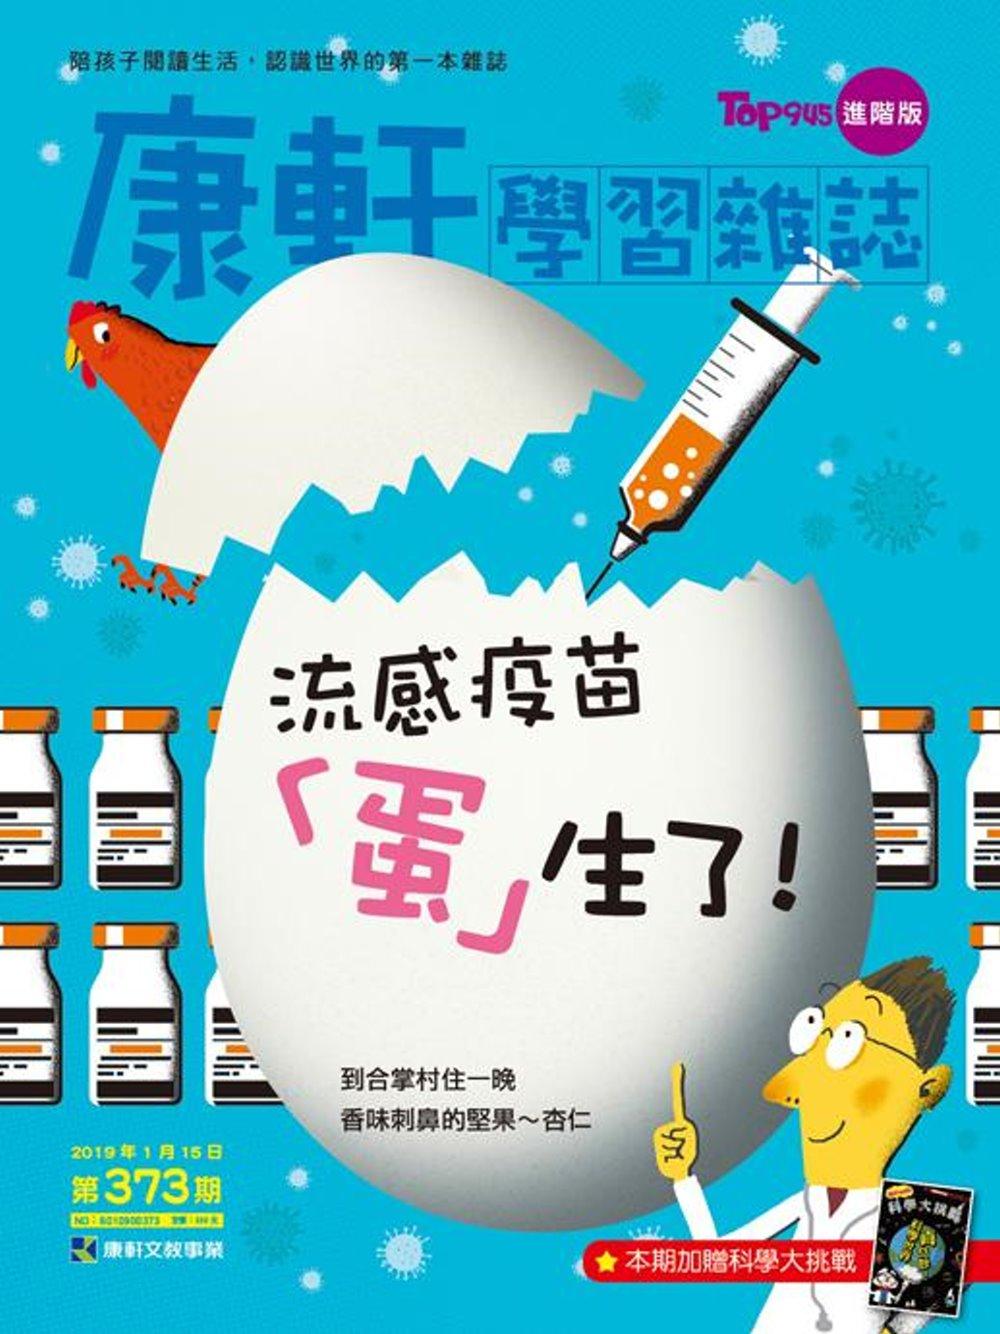 Top945康軒學習雜誌進階版 2019/1/15第373期